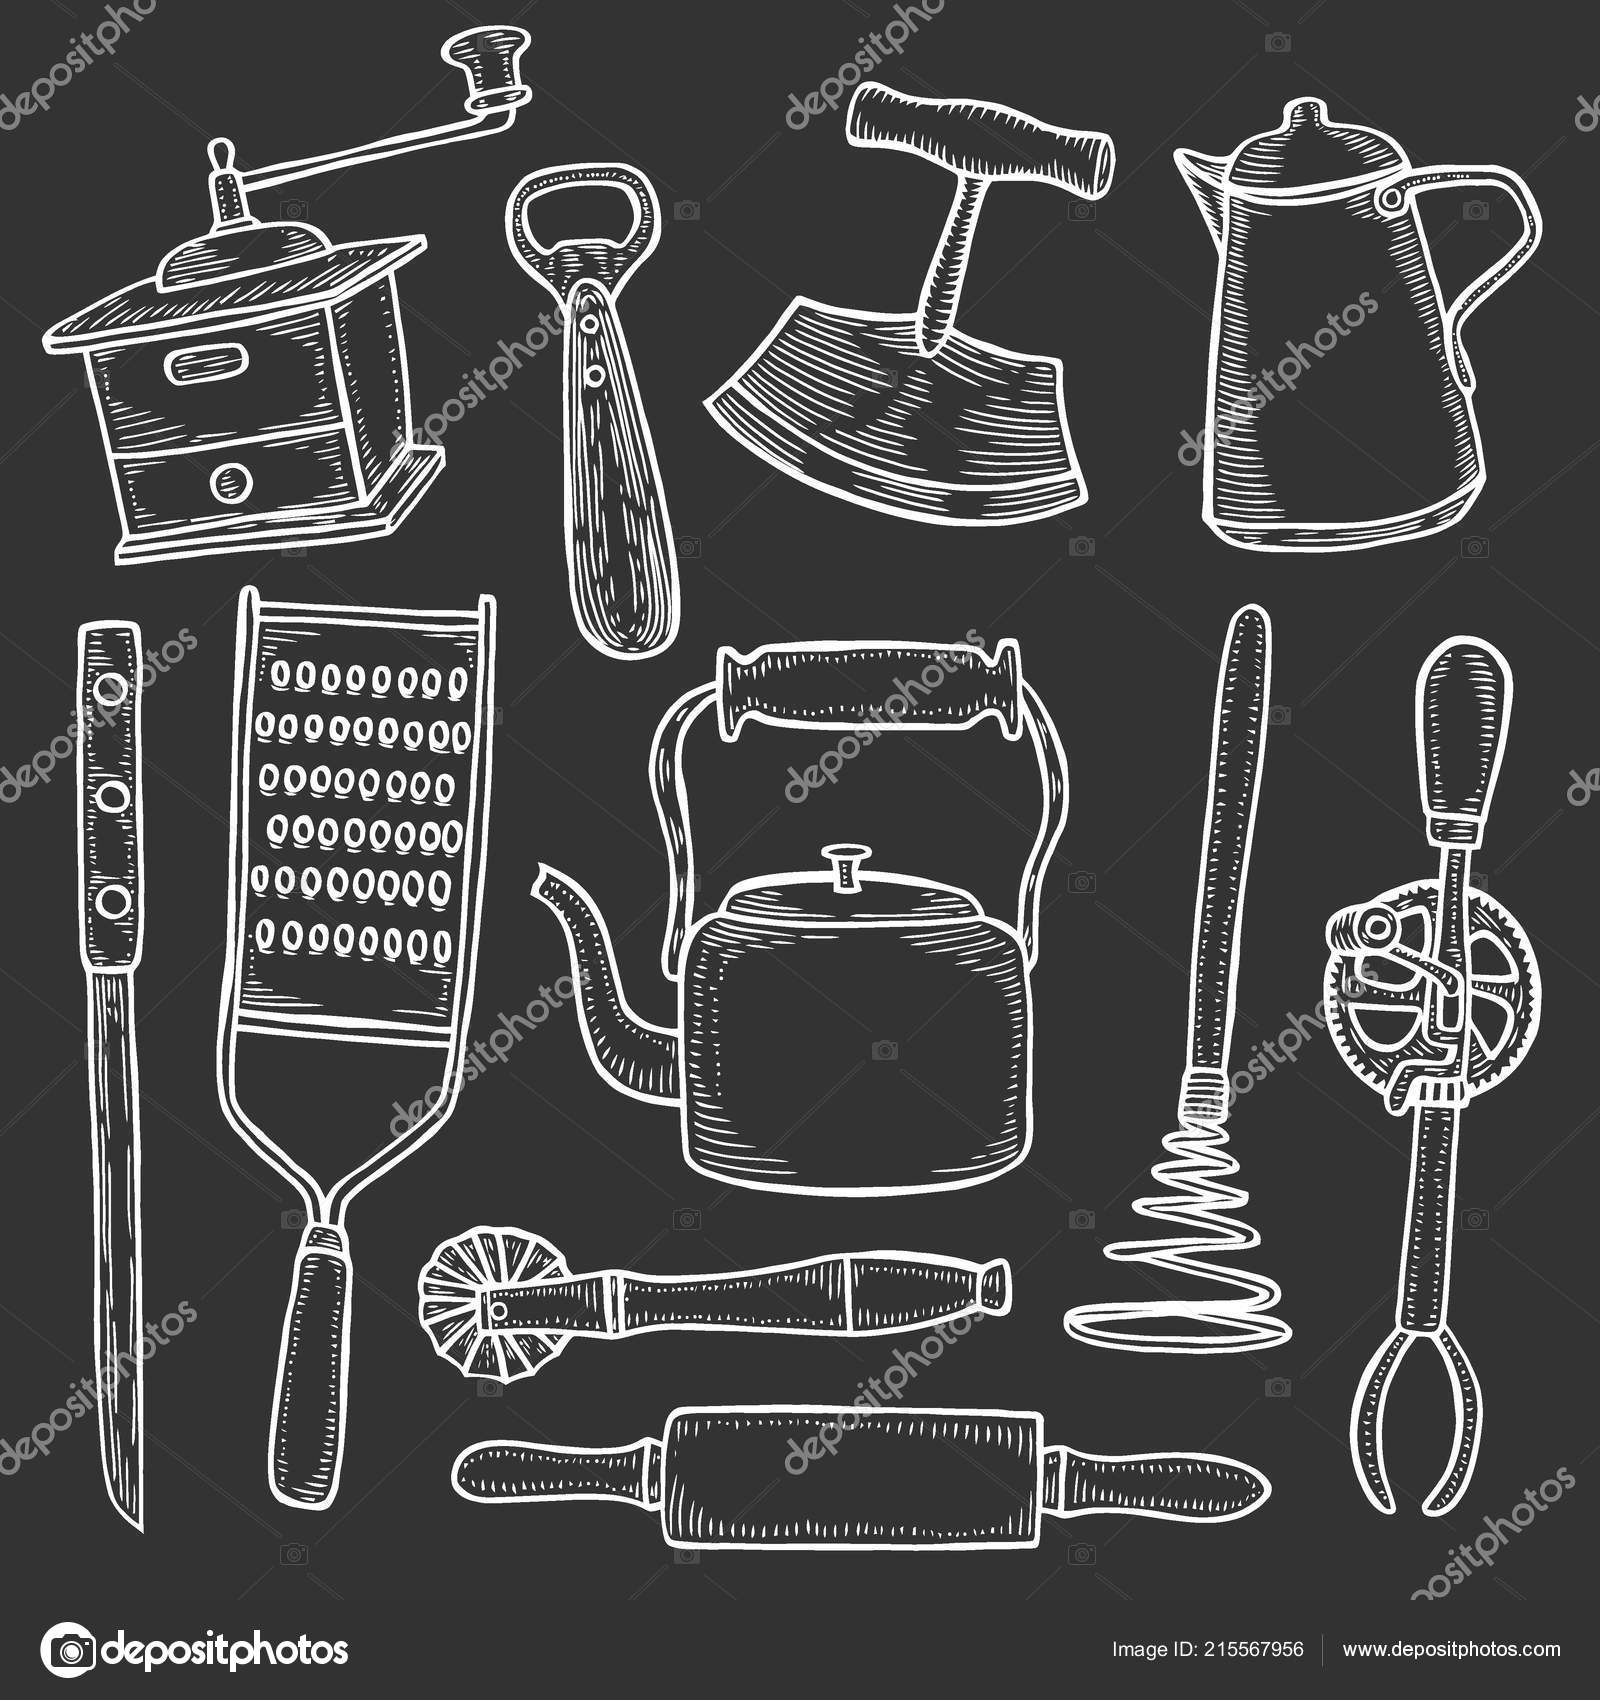 black kitchen appliances sink protectors 套厨房用具雕刻孤立的黑色矢量插图 图库矢量图像 c frescomovie 215567956 图库矢量图片